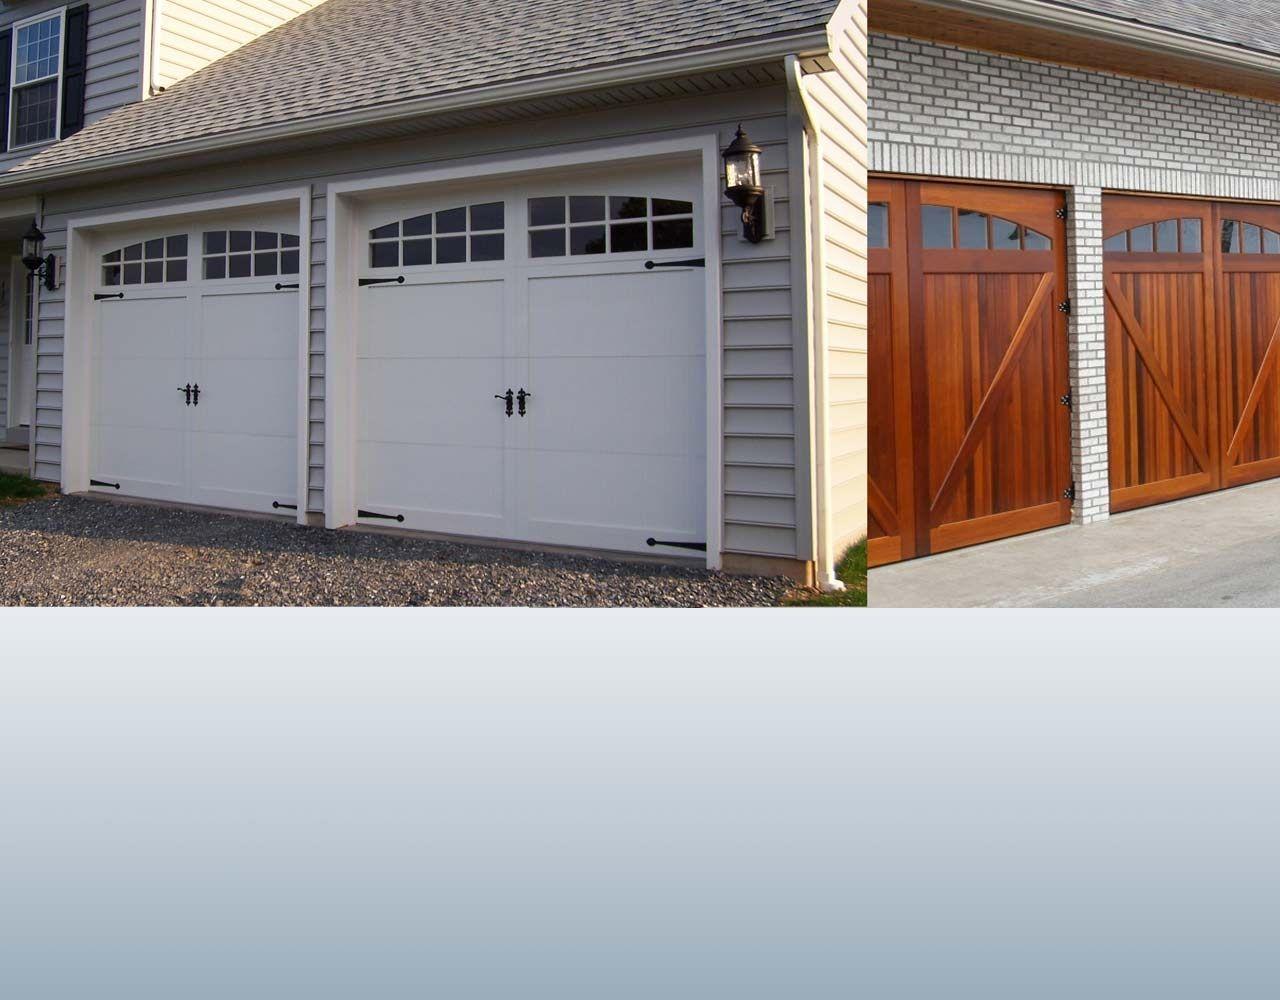 Anaheim Garage Door Opener Httpvoteno123 Pinterest